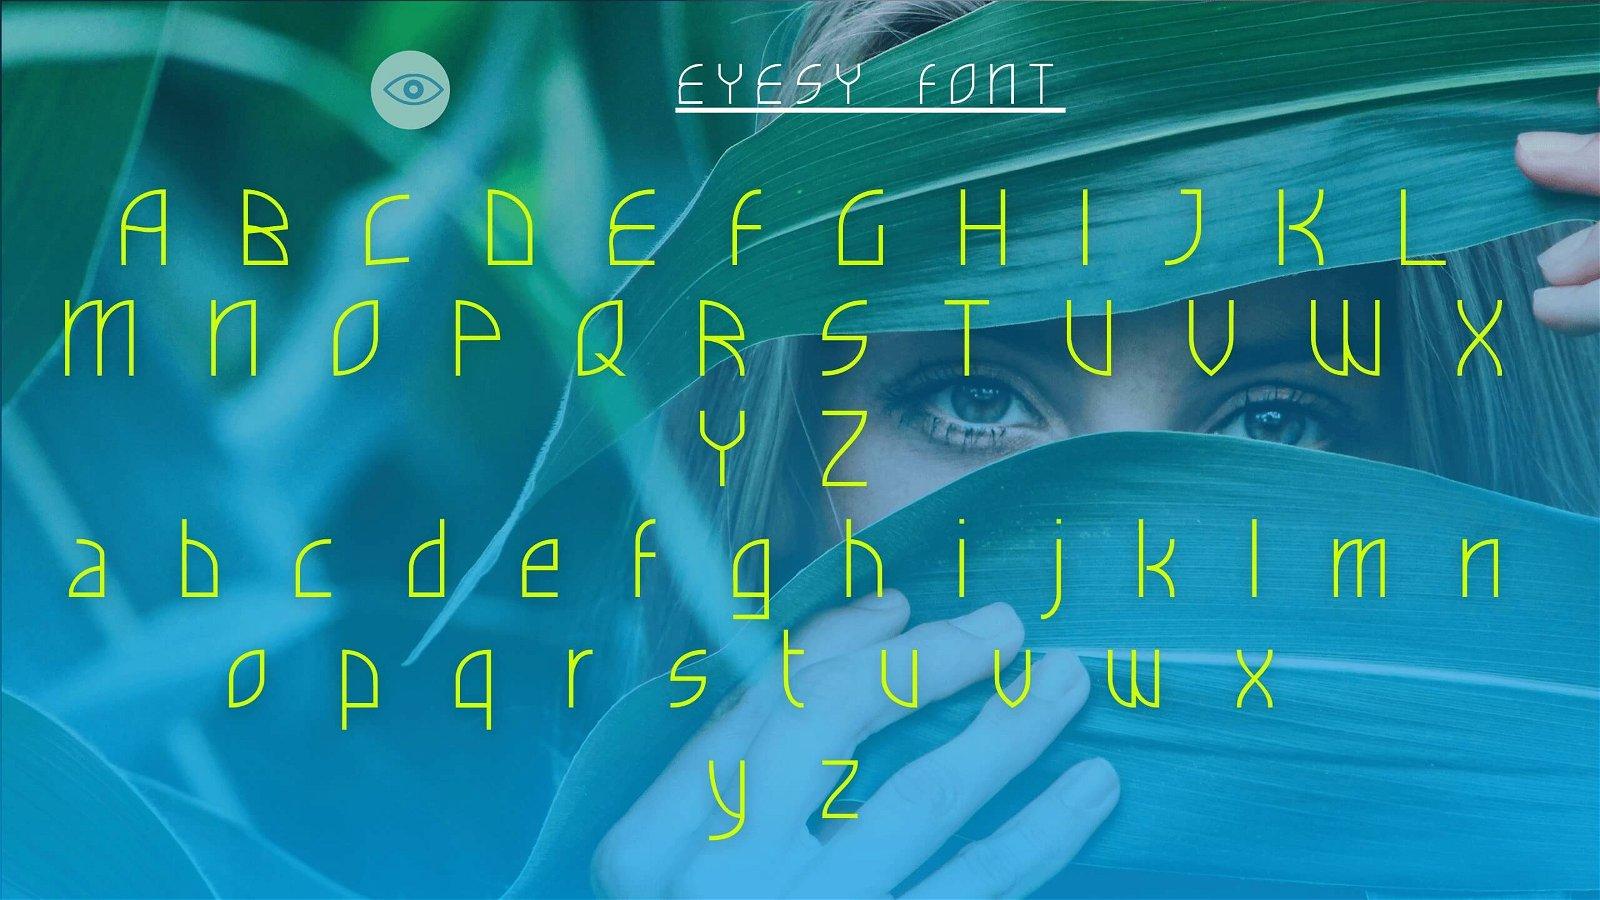 View of Eyesy - Eyesy Font Free Download